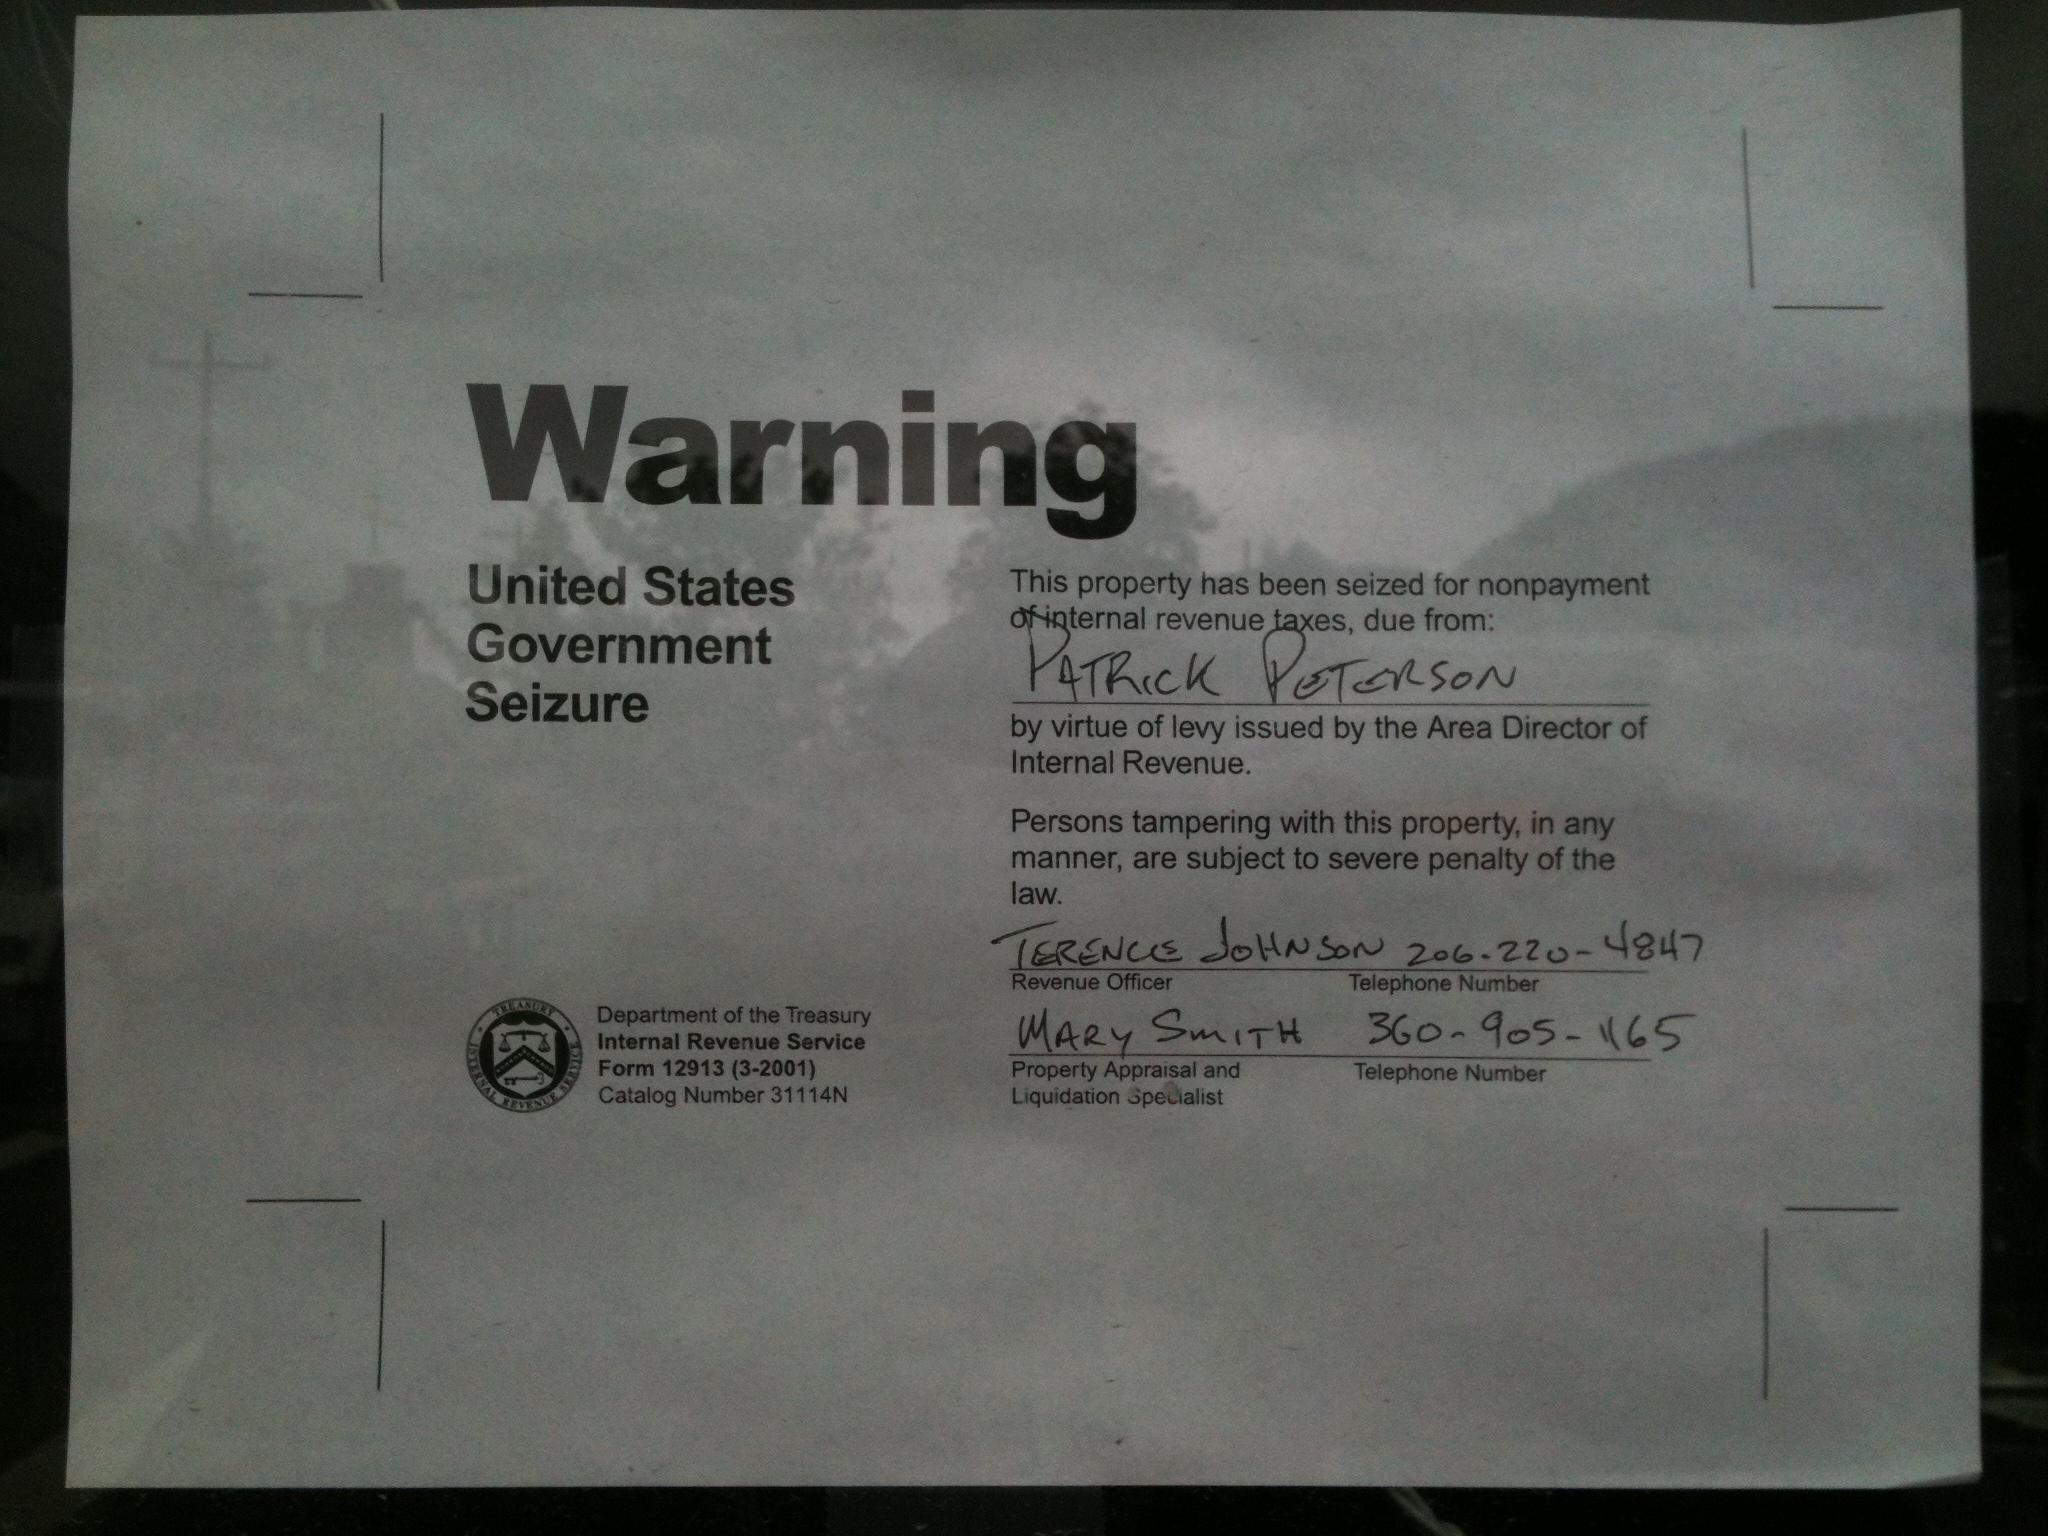 Seizure notice